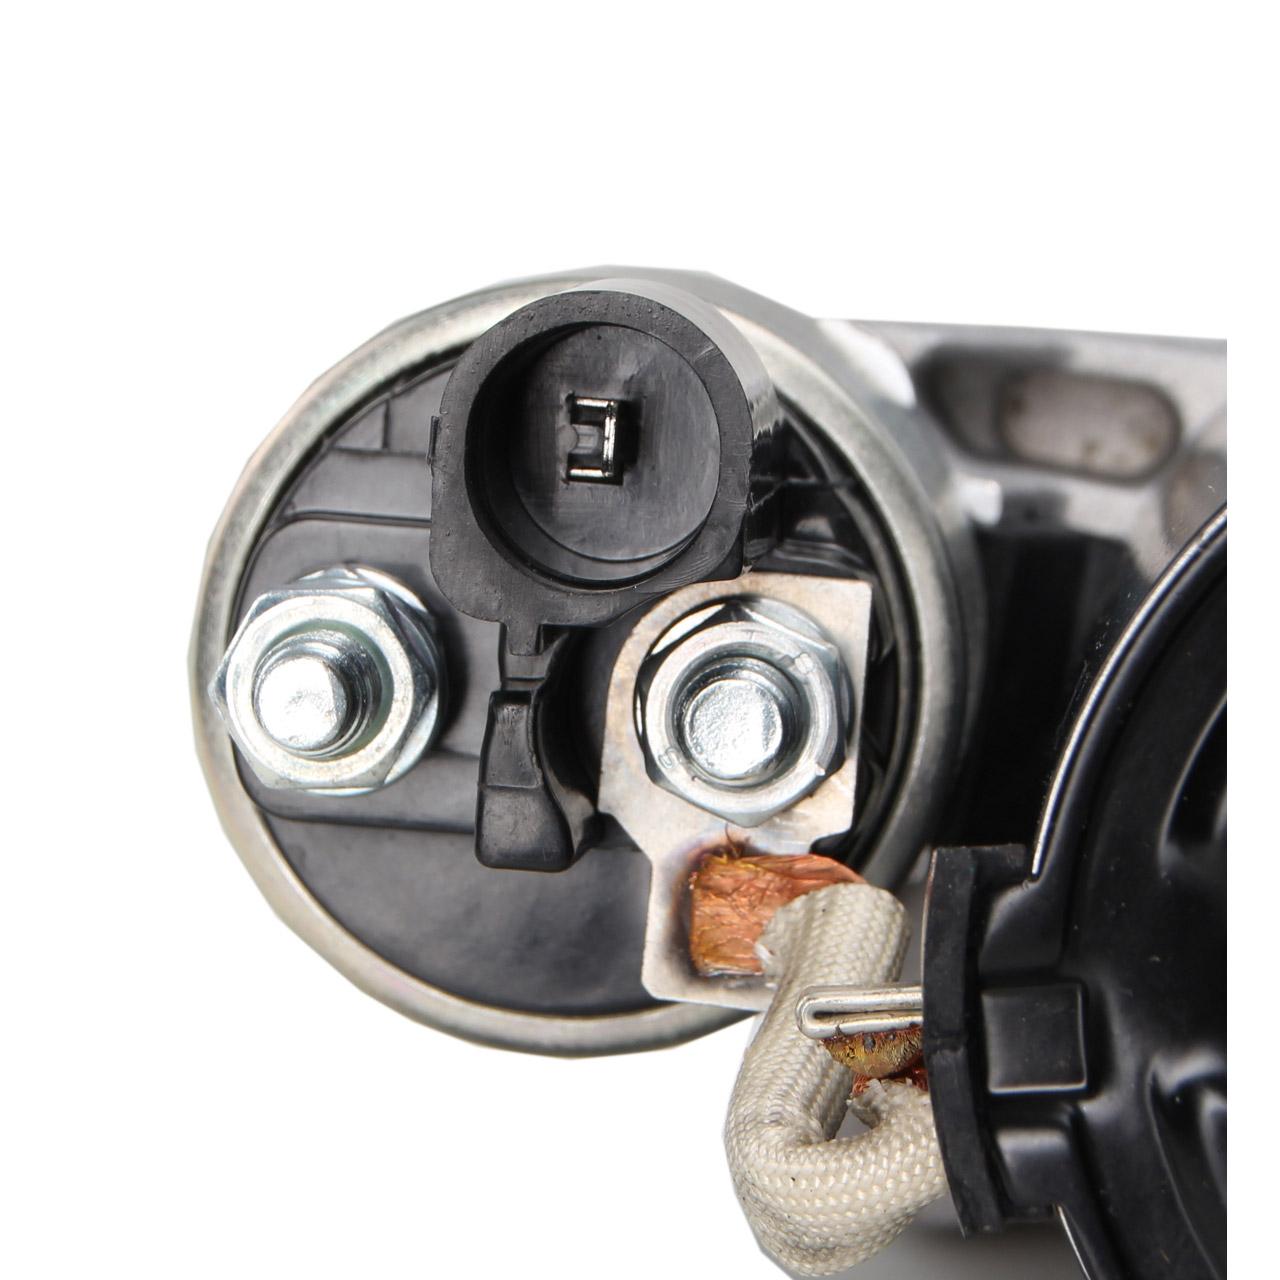 HERTH+BUSS ELPARTS Anlasser Starter 12V 2,2 kW AUDI A4 A6 VW Phaeton 2.7/3.0 TDI